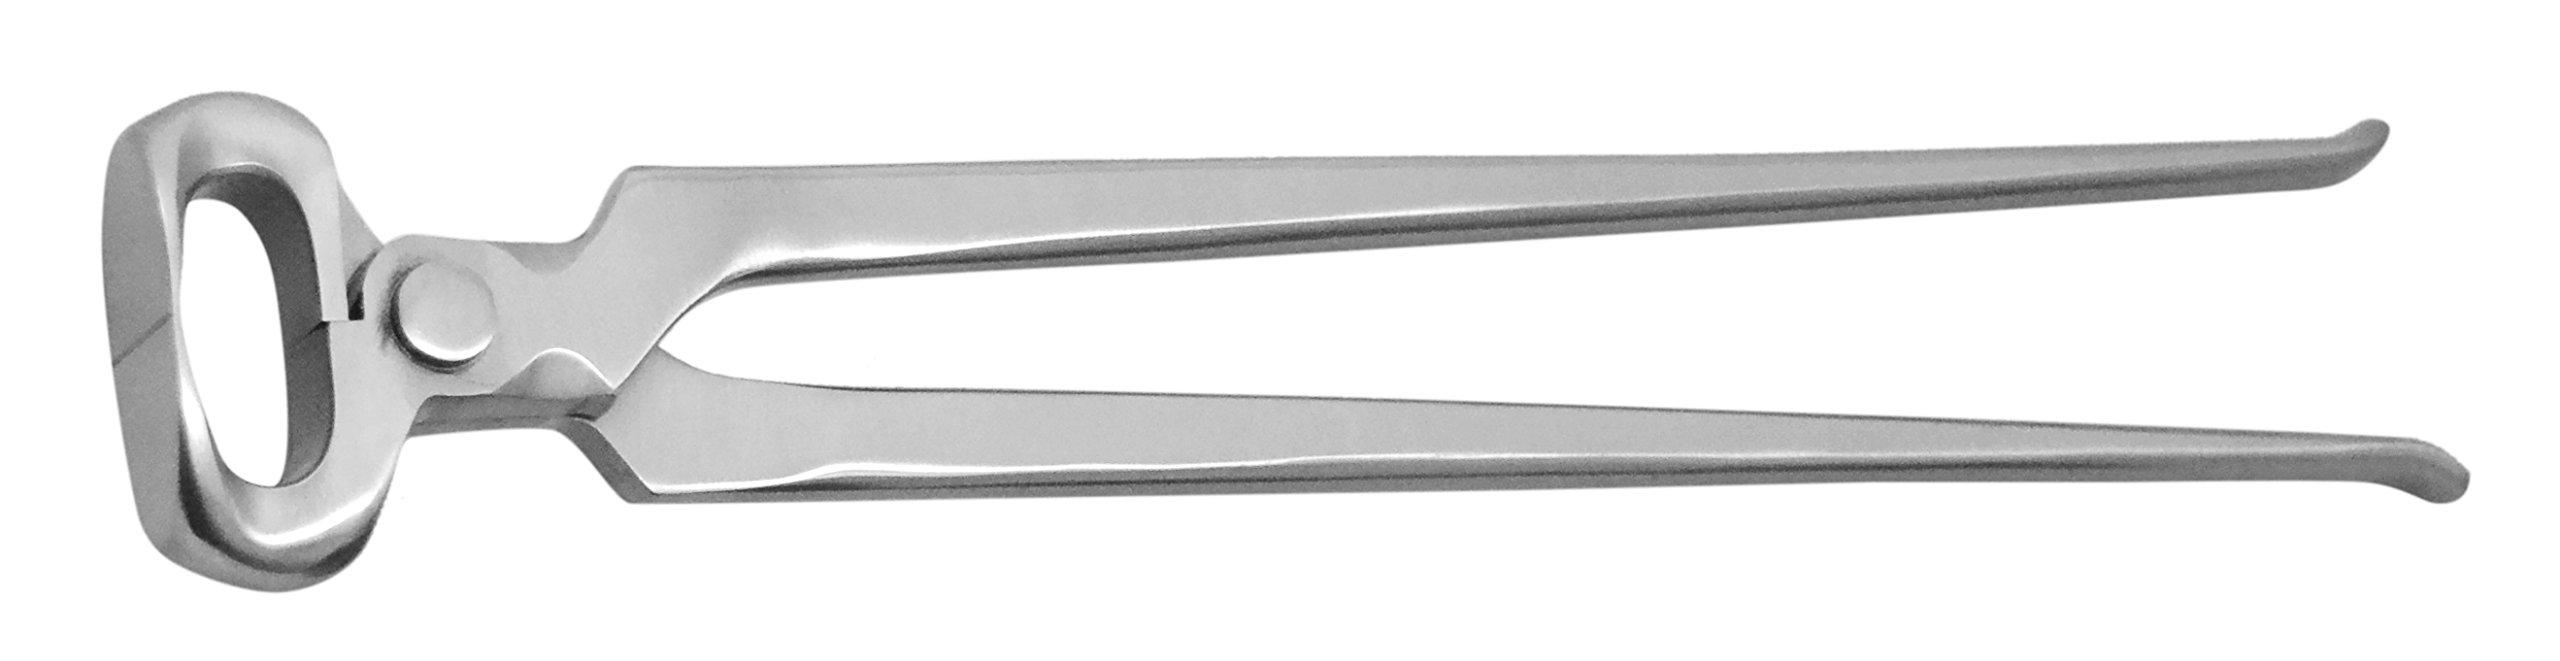 SiS EQUINOX Farrier Hoof Nipper 15'' Trimmer Pincers Steel Quality Farrier Tools by SiS EQUINOX